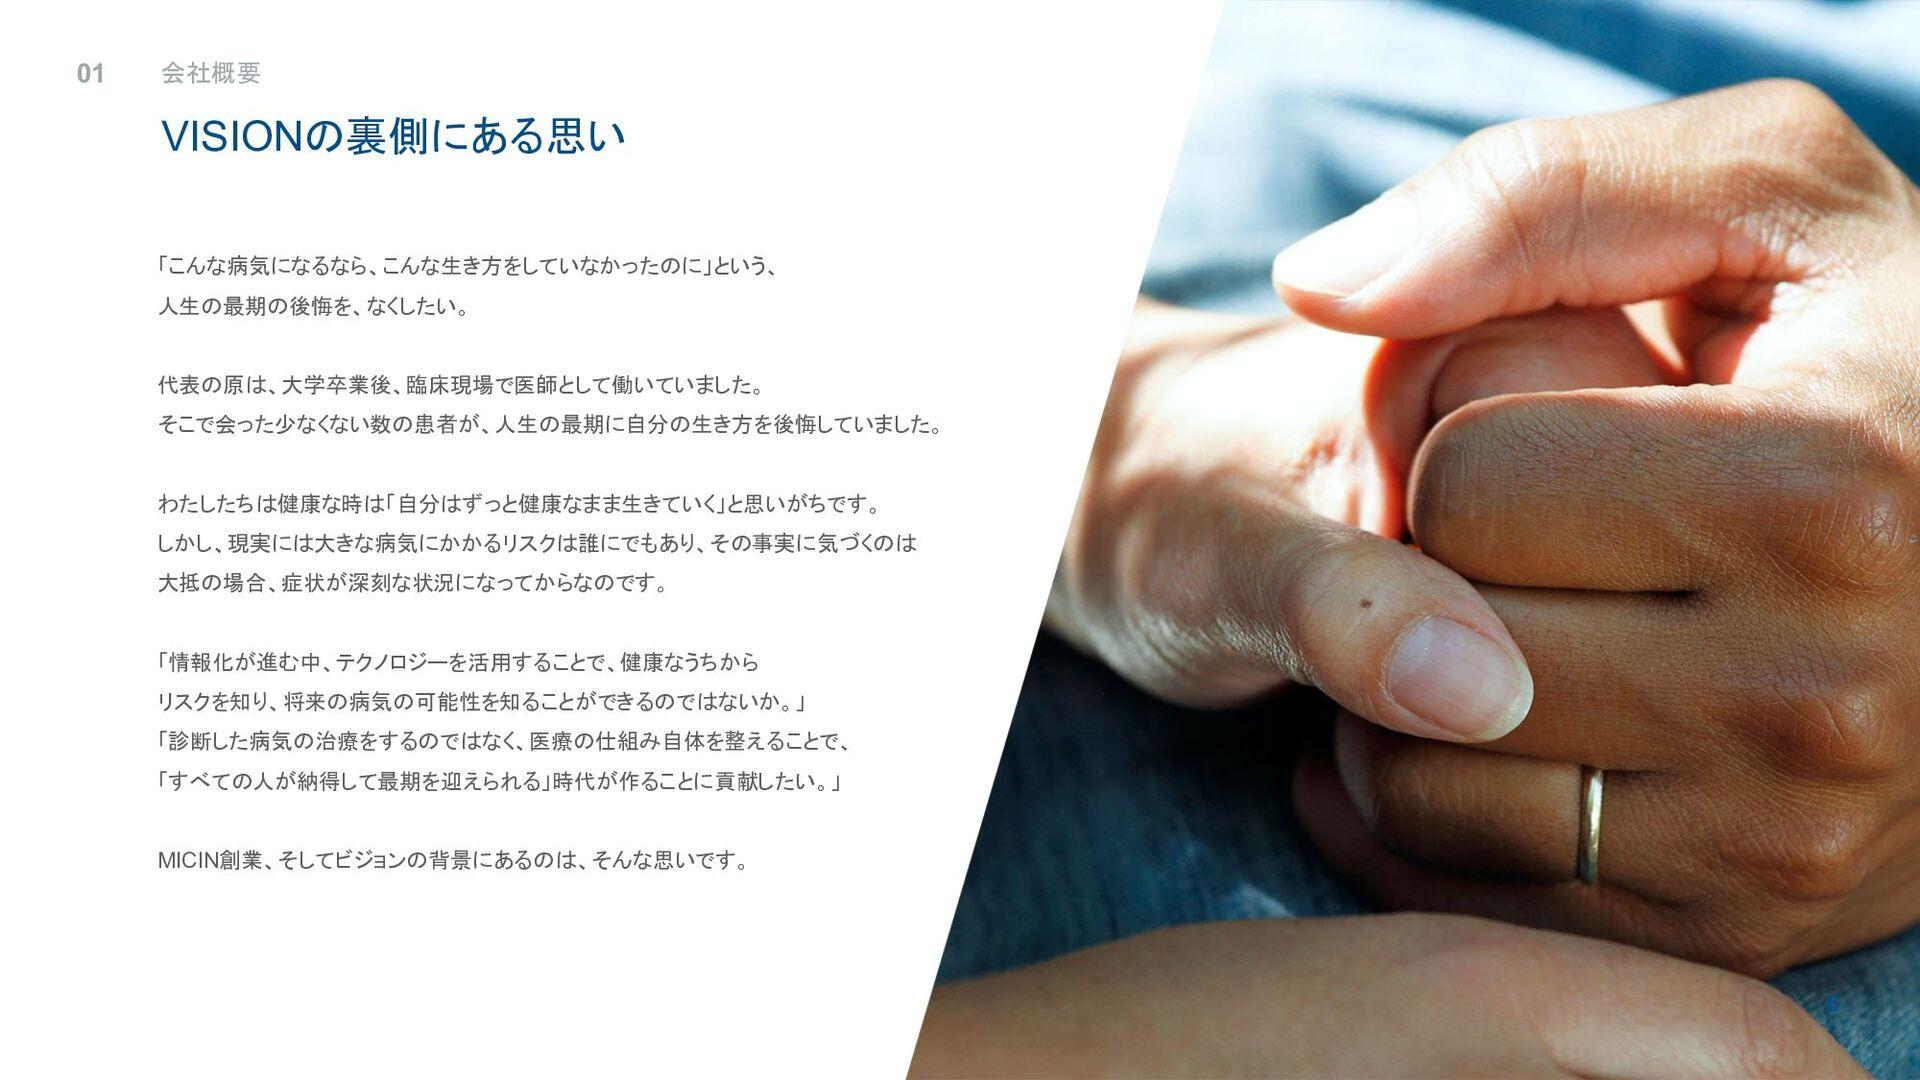 micin.jp ʛ All rights reserved 6 VISIONͷཪଆʹ͋Δࢥ͍...